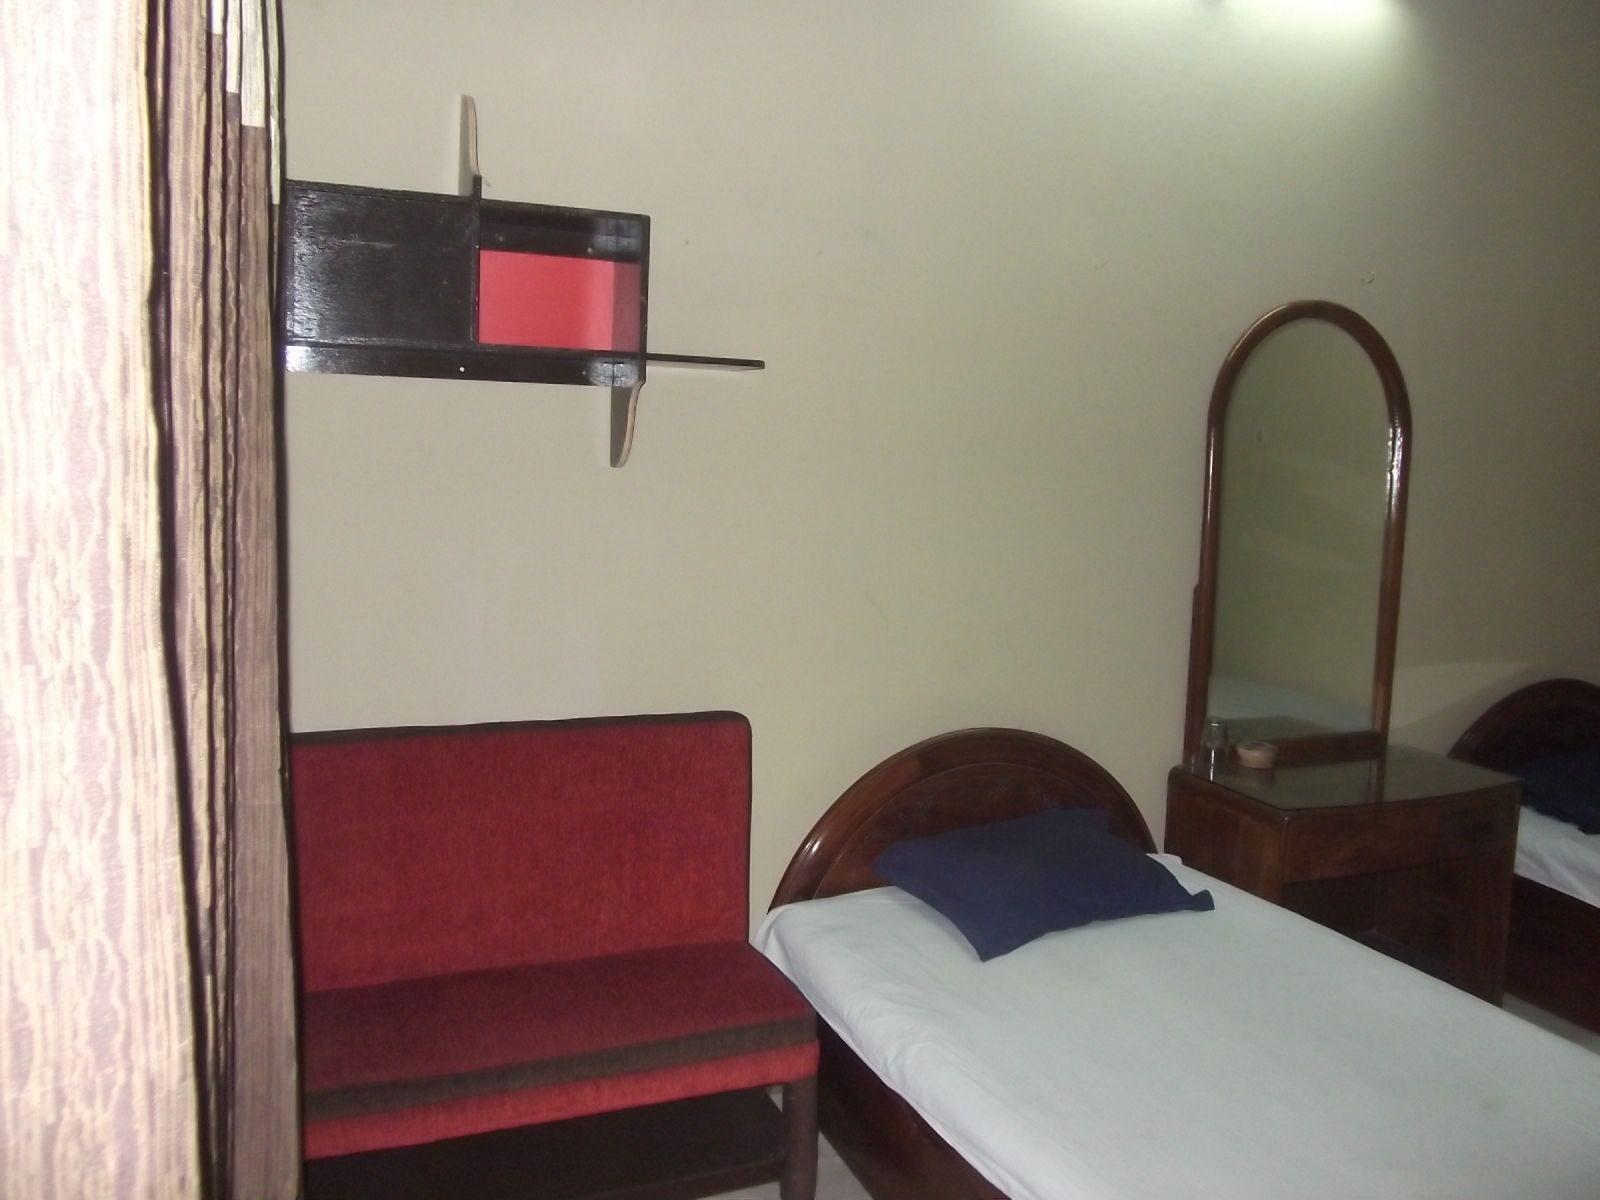 Azmiry Residential Hotel, Kustia